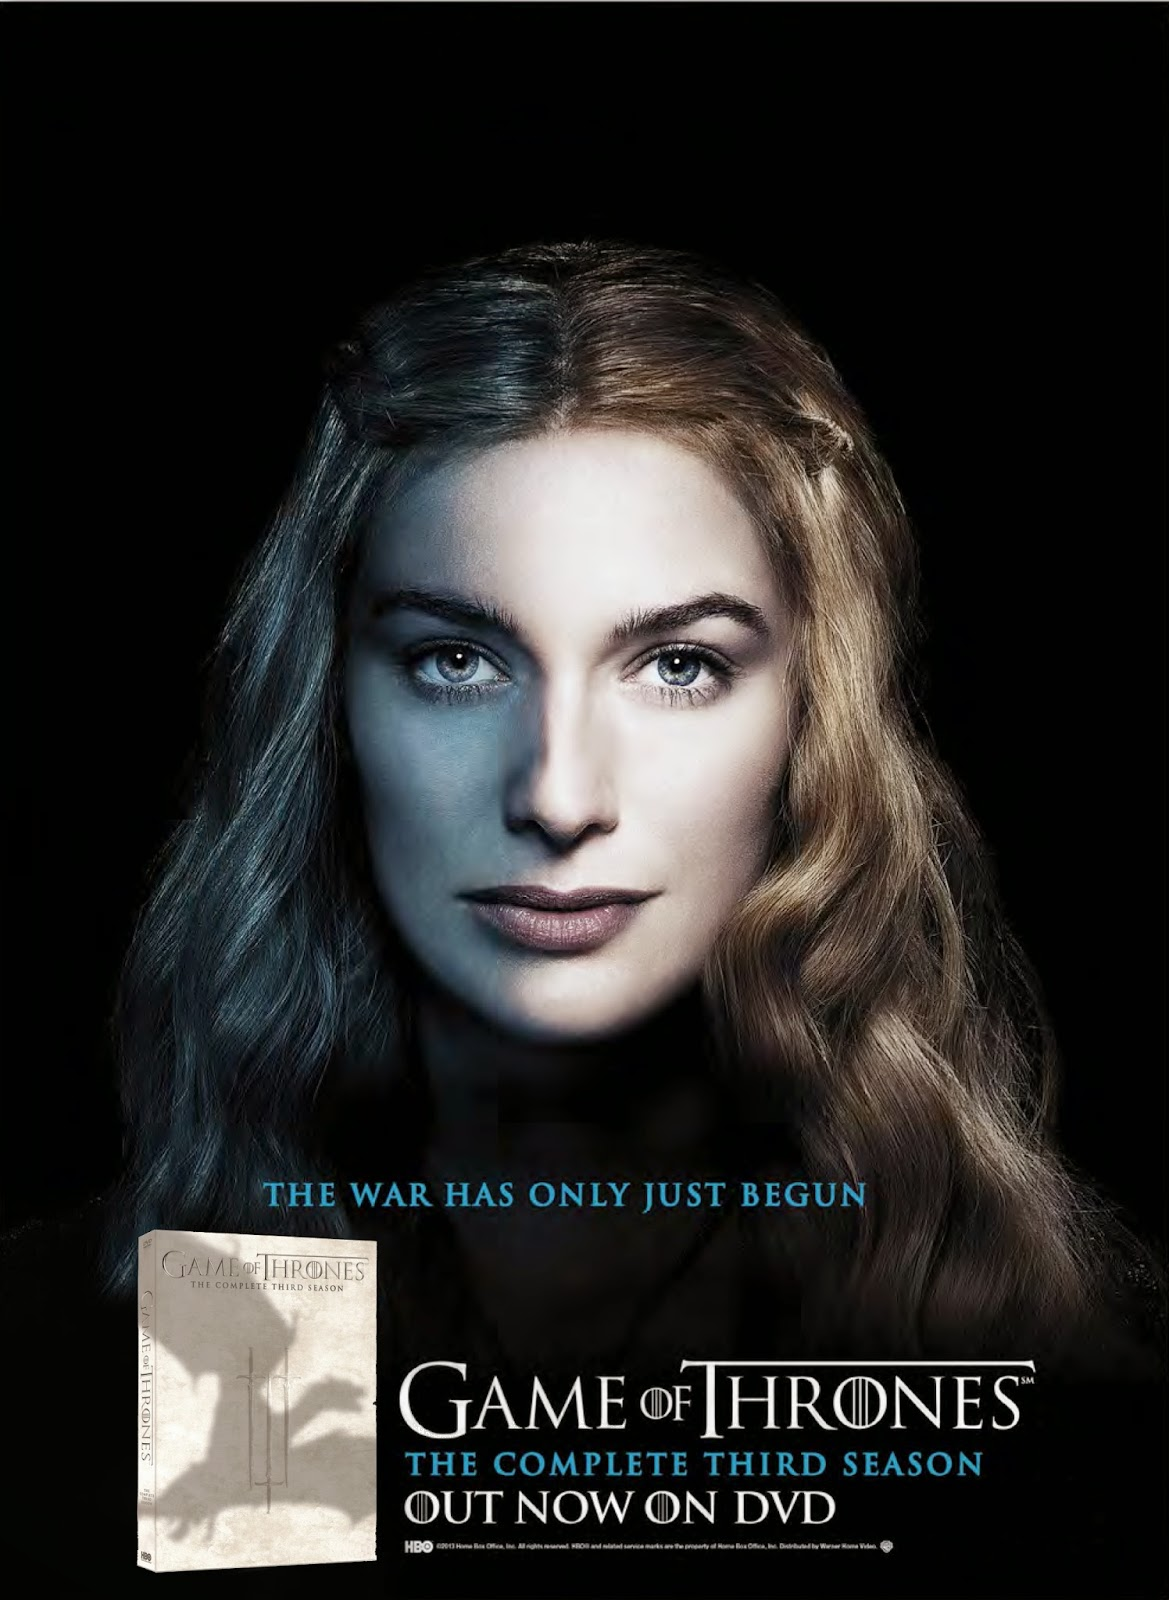 Natalie Dormer Margaery Tyrell Season 3 The complete third season nowNatalie Dormer Margaery Tyrell Season 3